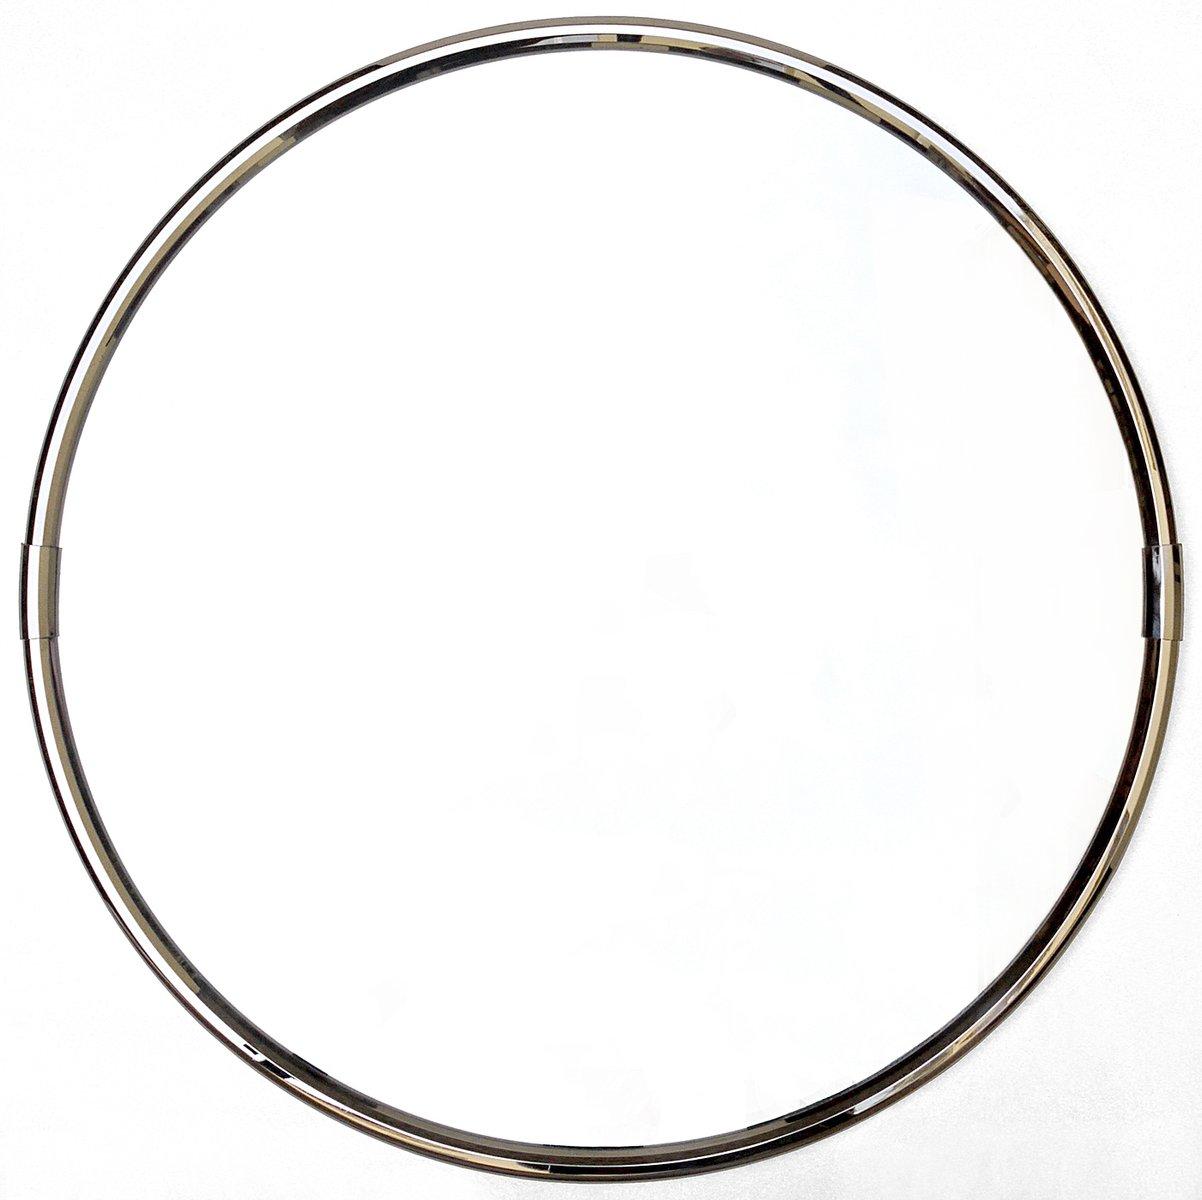 Espejo redondo con marco cromado a os 70 en venta en pamono for Espejo redondo con marco